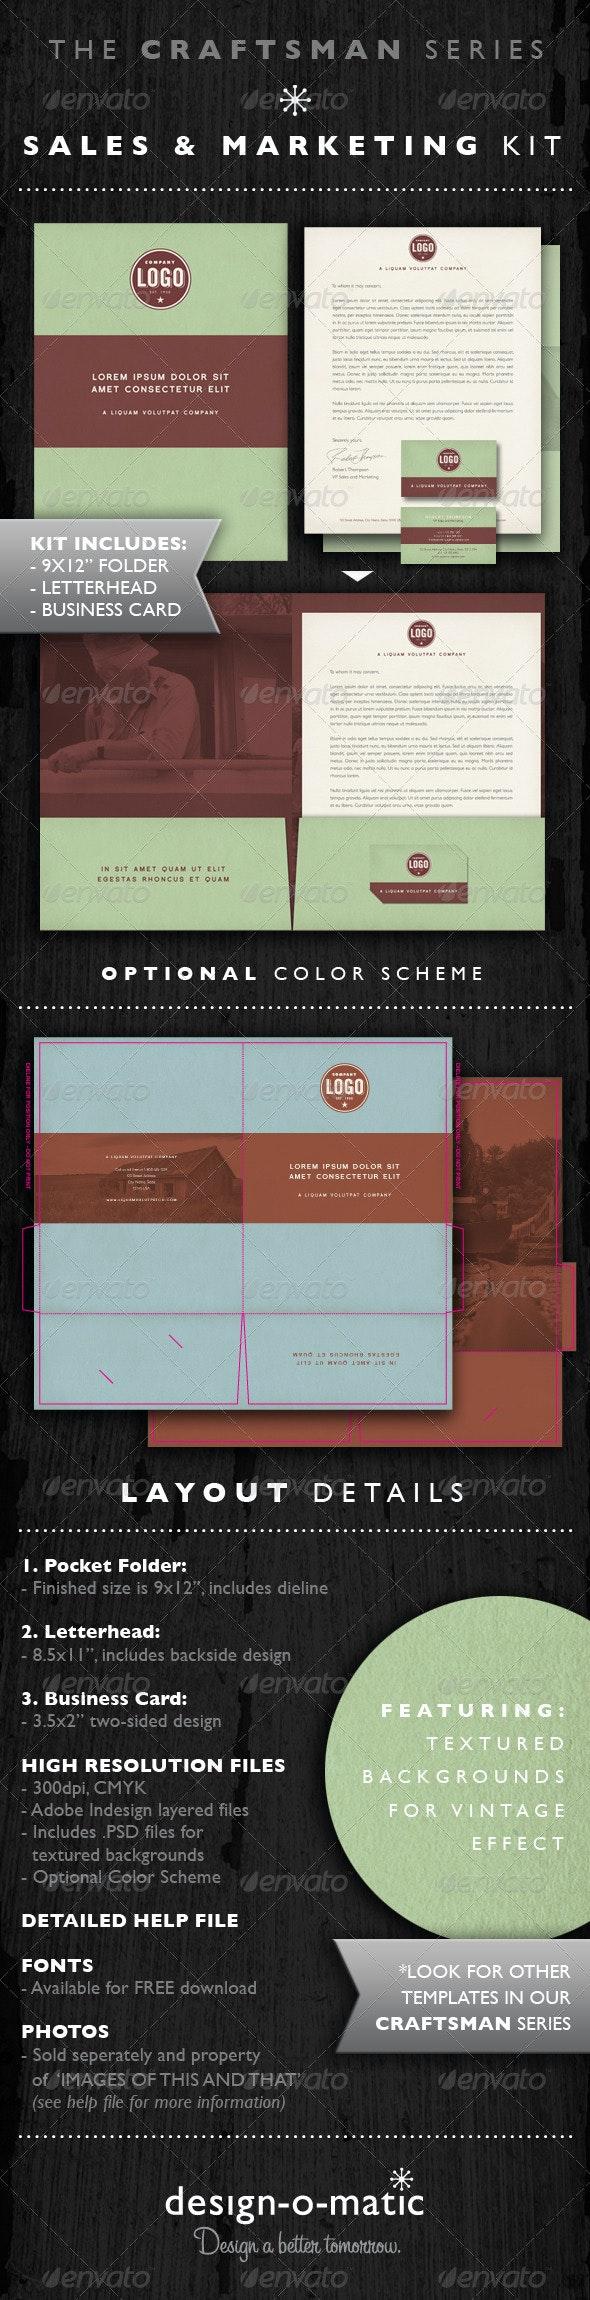 Sales & Marketing Kit Folder Template INDD - Miscellaneous Print Templates